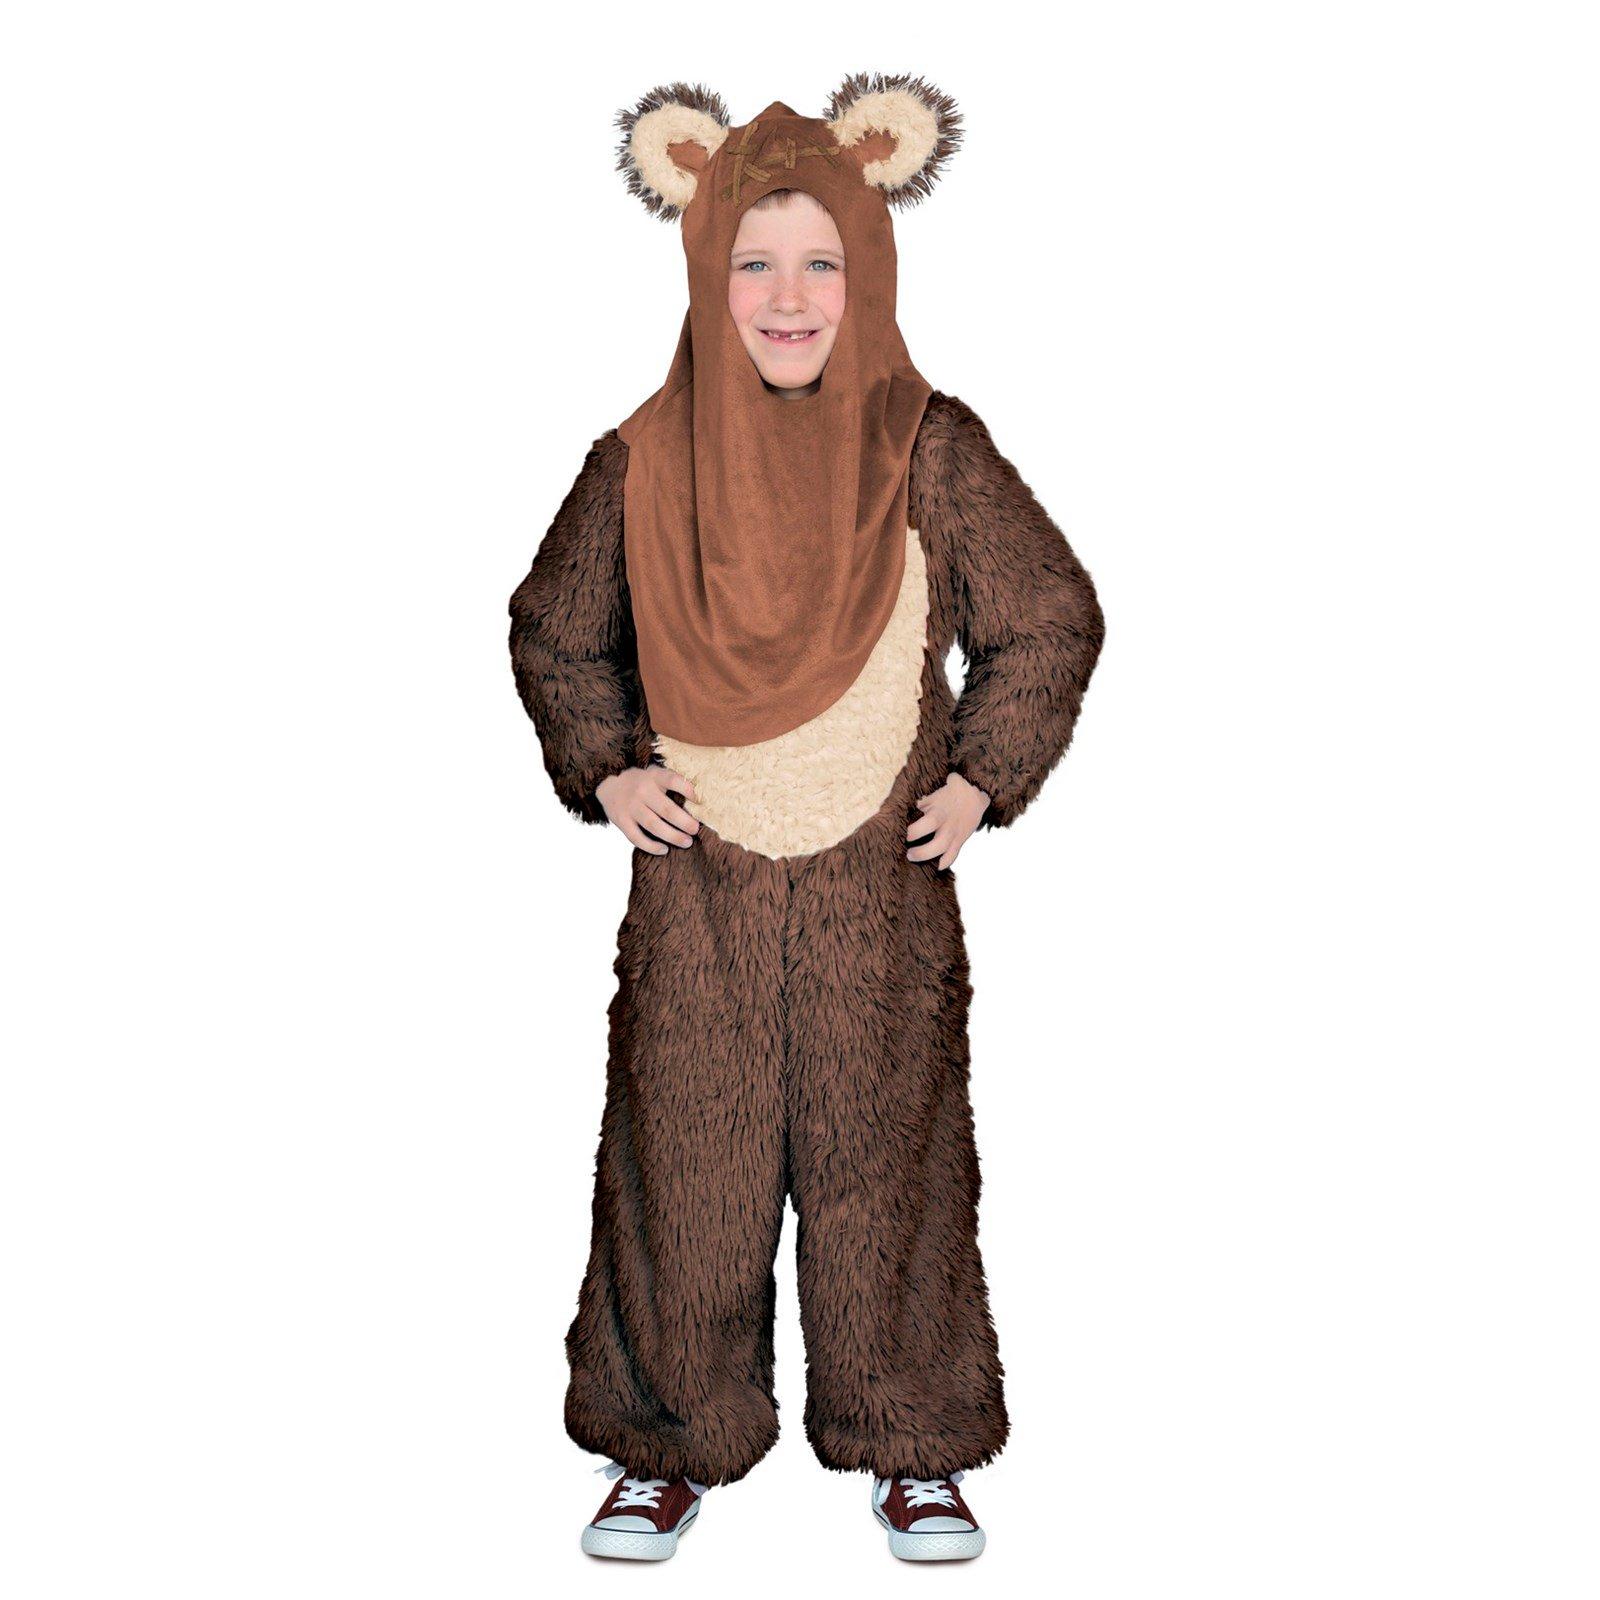 Classic Star Wars Premium Wicket Halloween Costume Jumpsuit